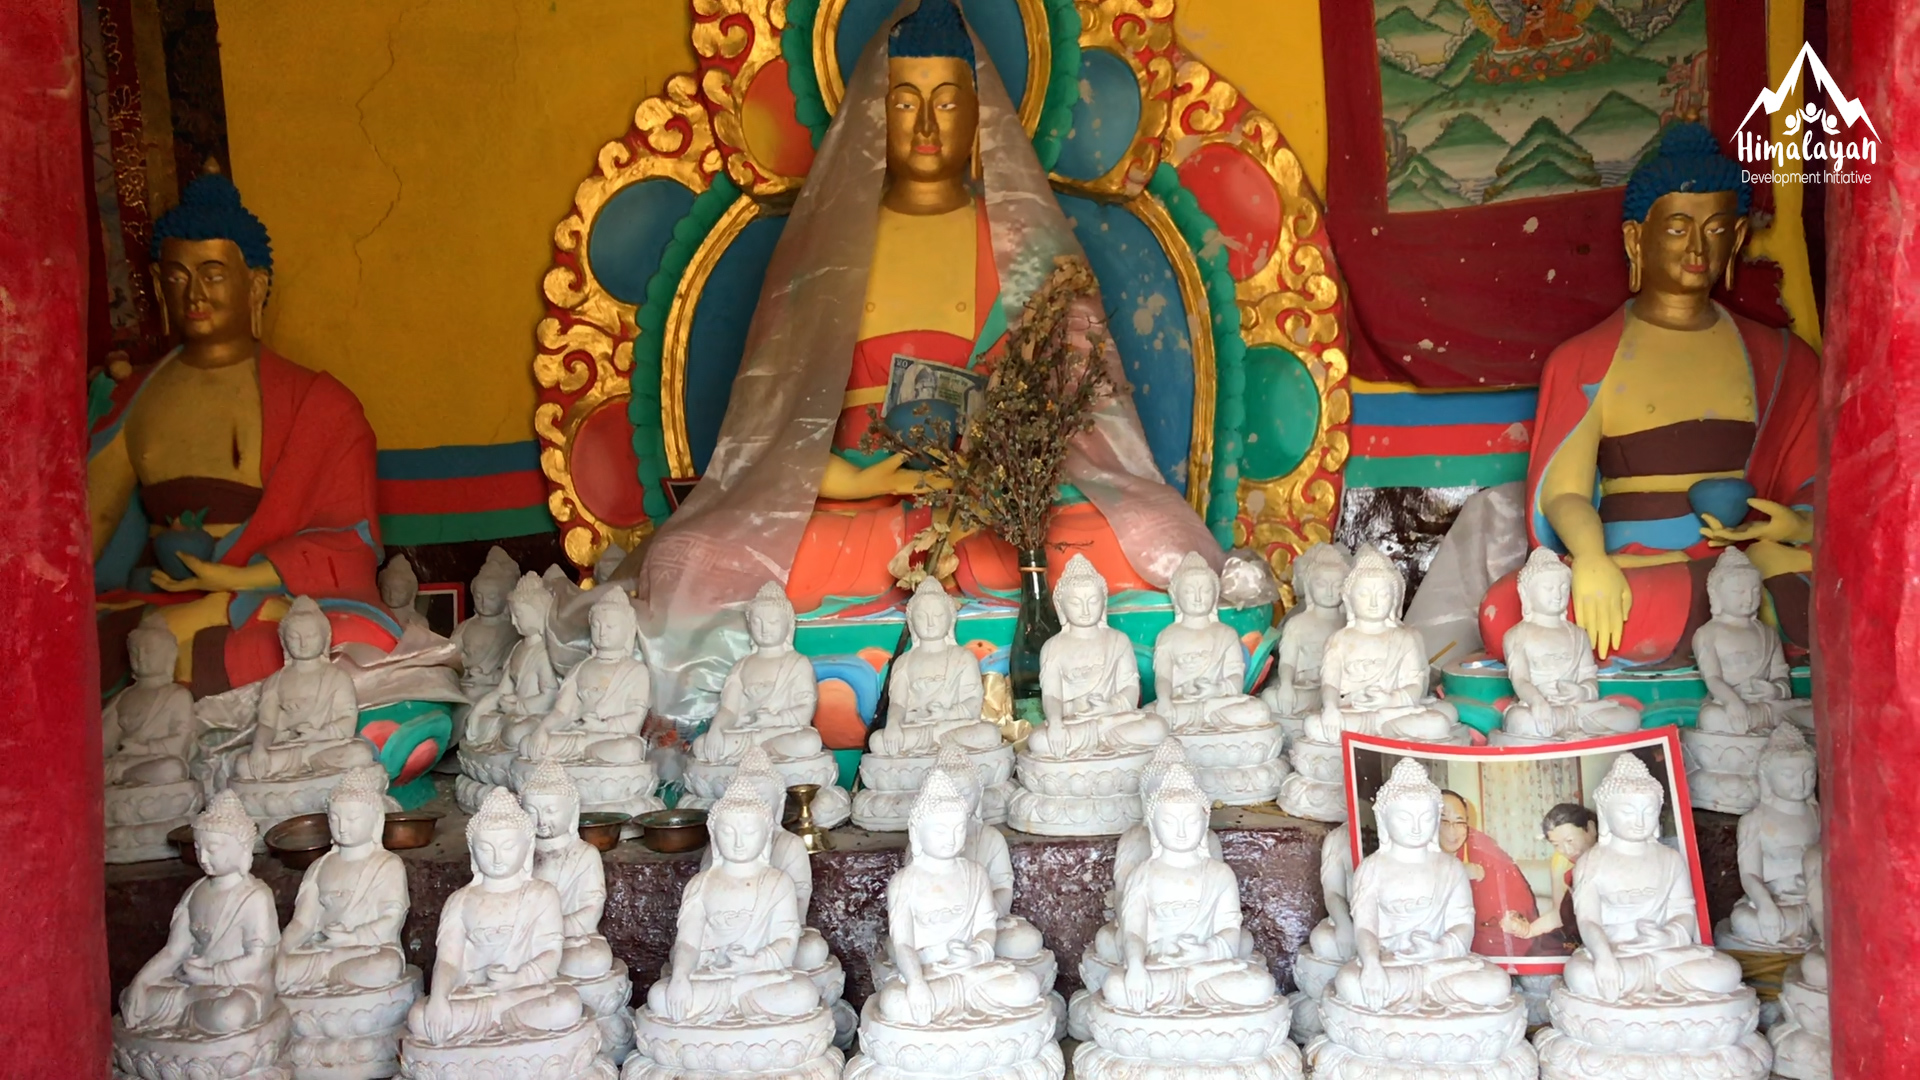 HAPPY 2565th BUDDHA JAYANTI